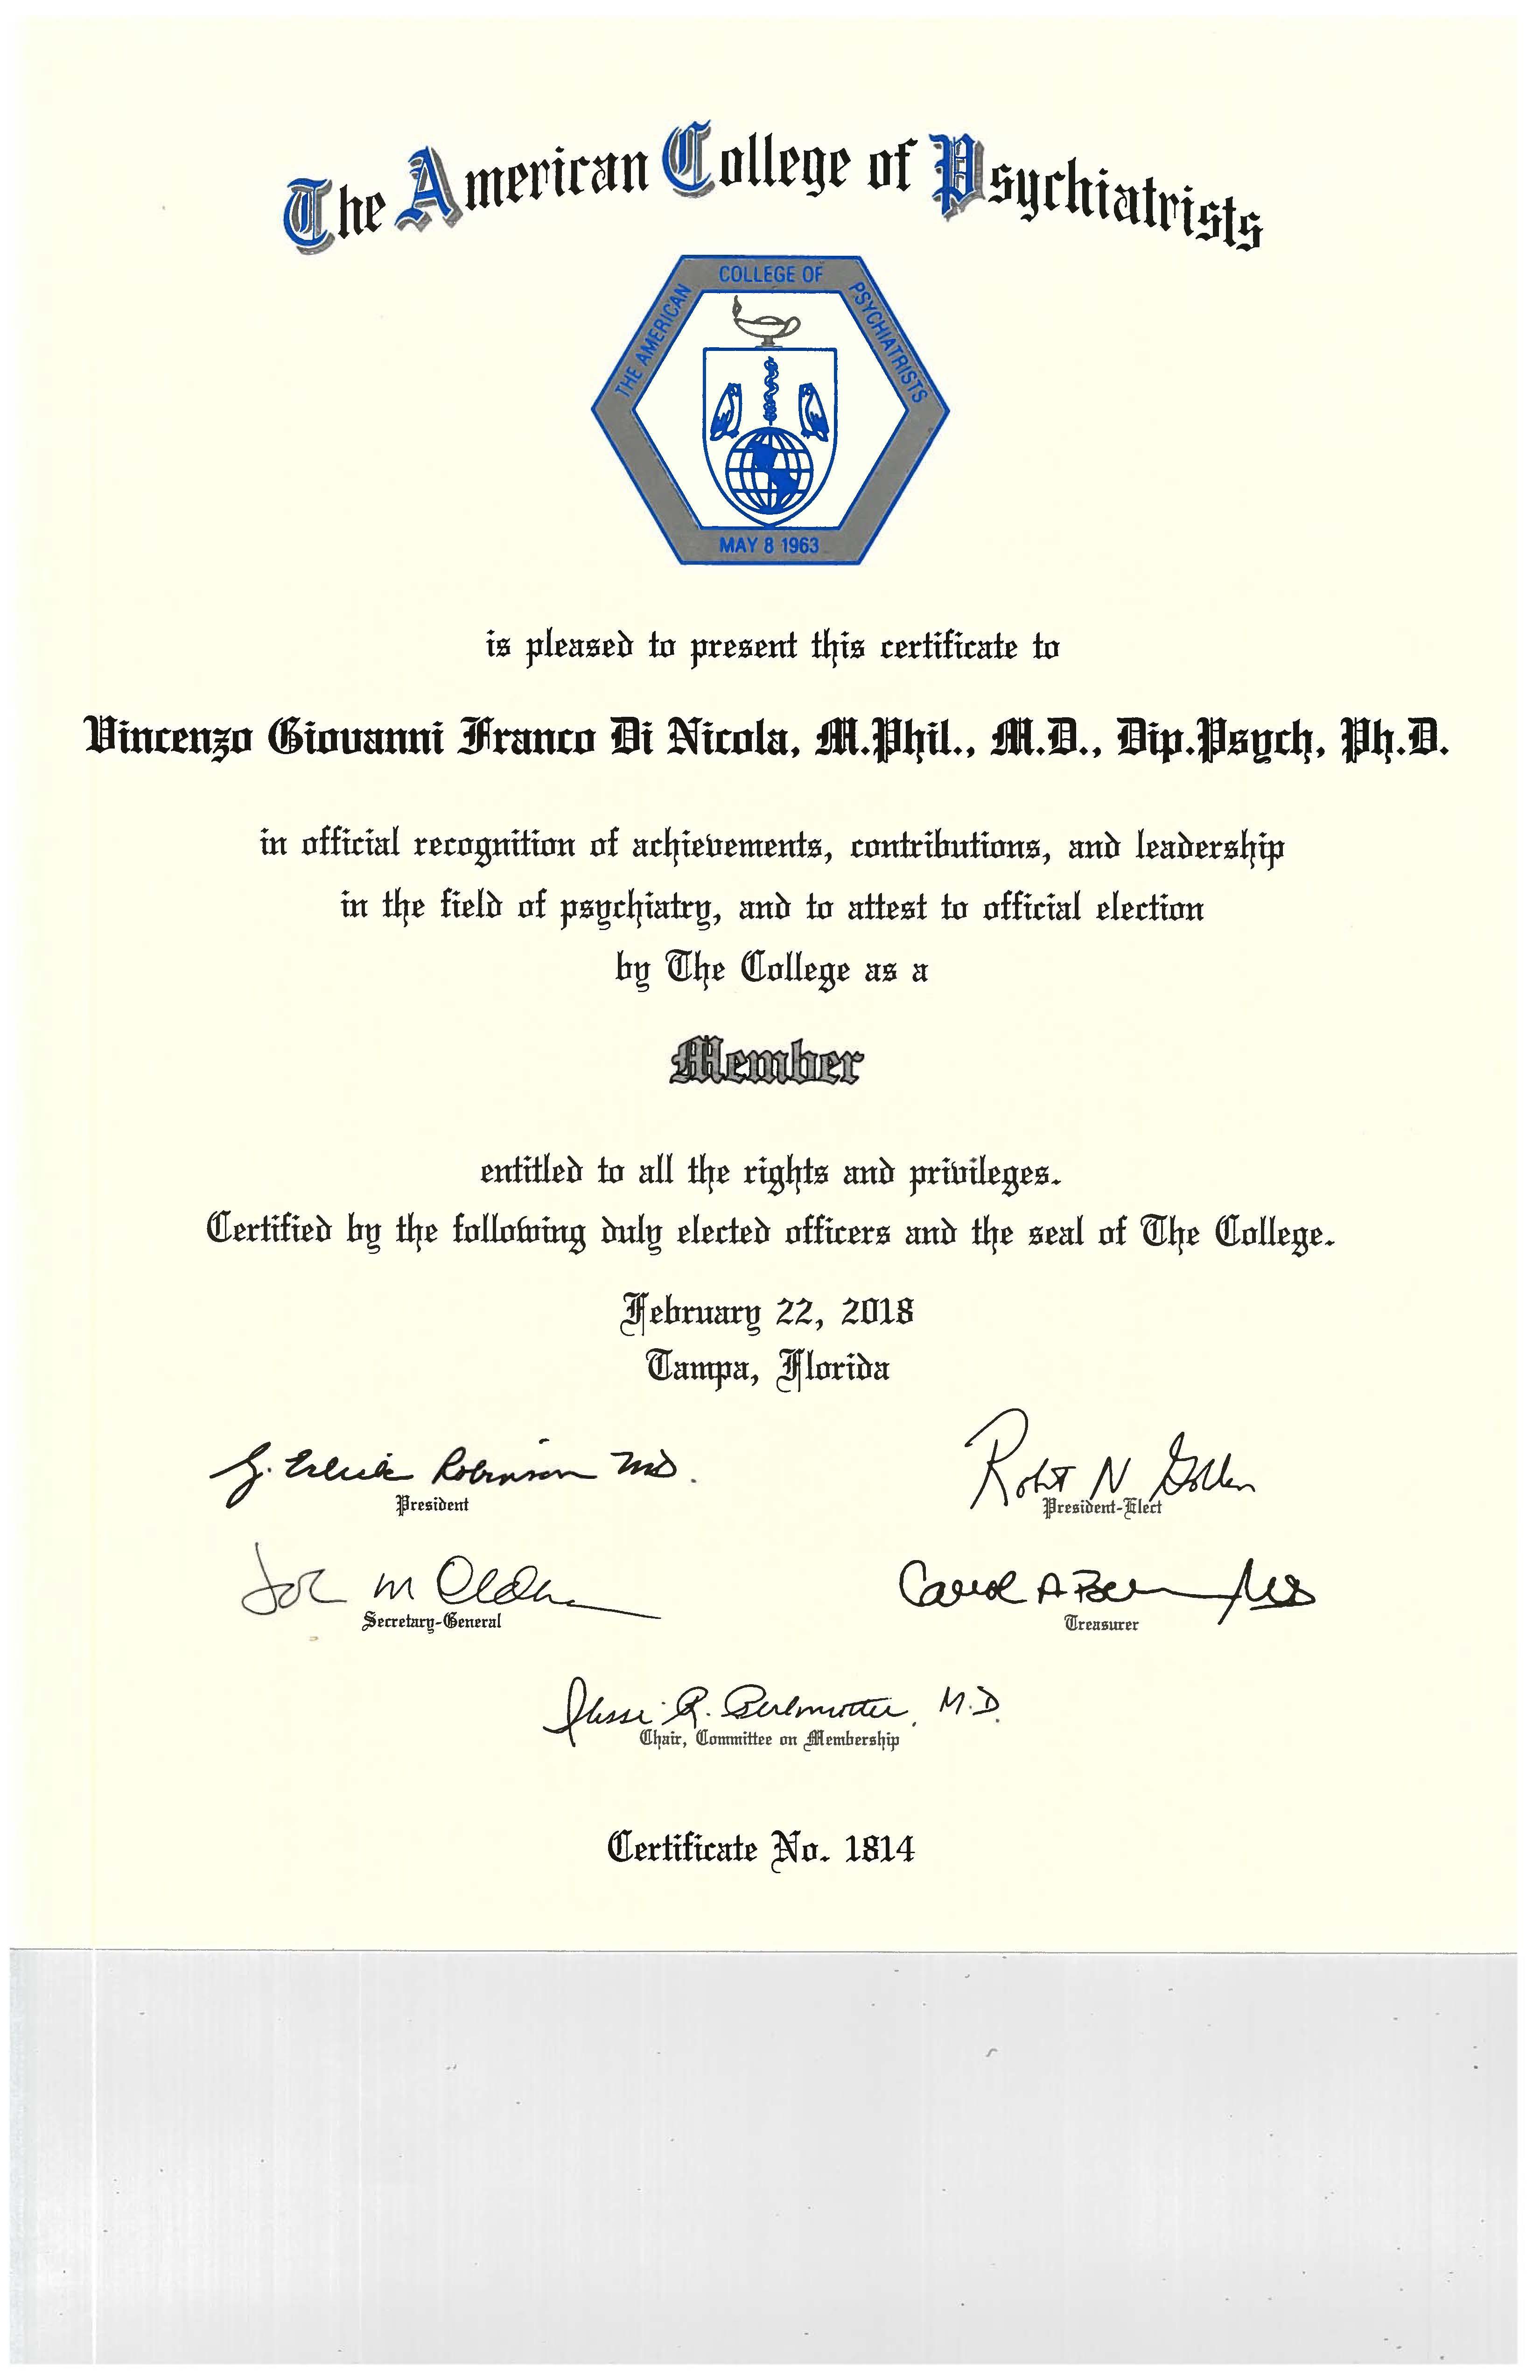 Member Certificate American College of Psychiatrists - Tampa, FL, USA - February 22, 2018 - Vincenzo Di Nicola